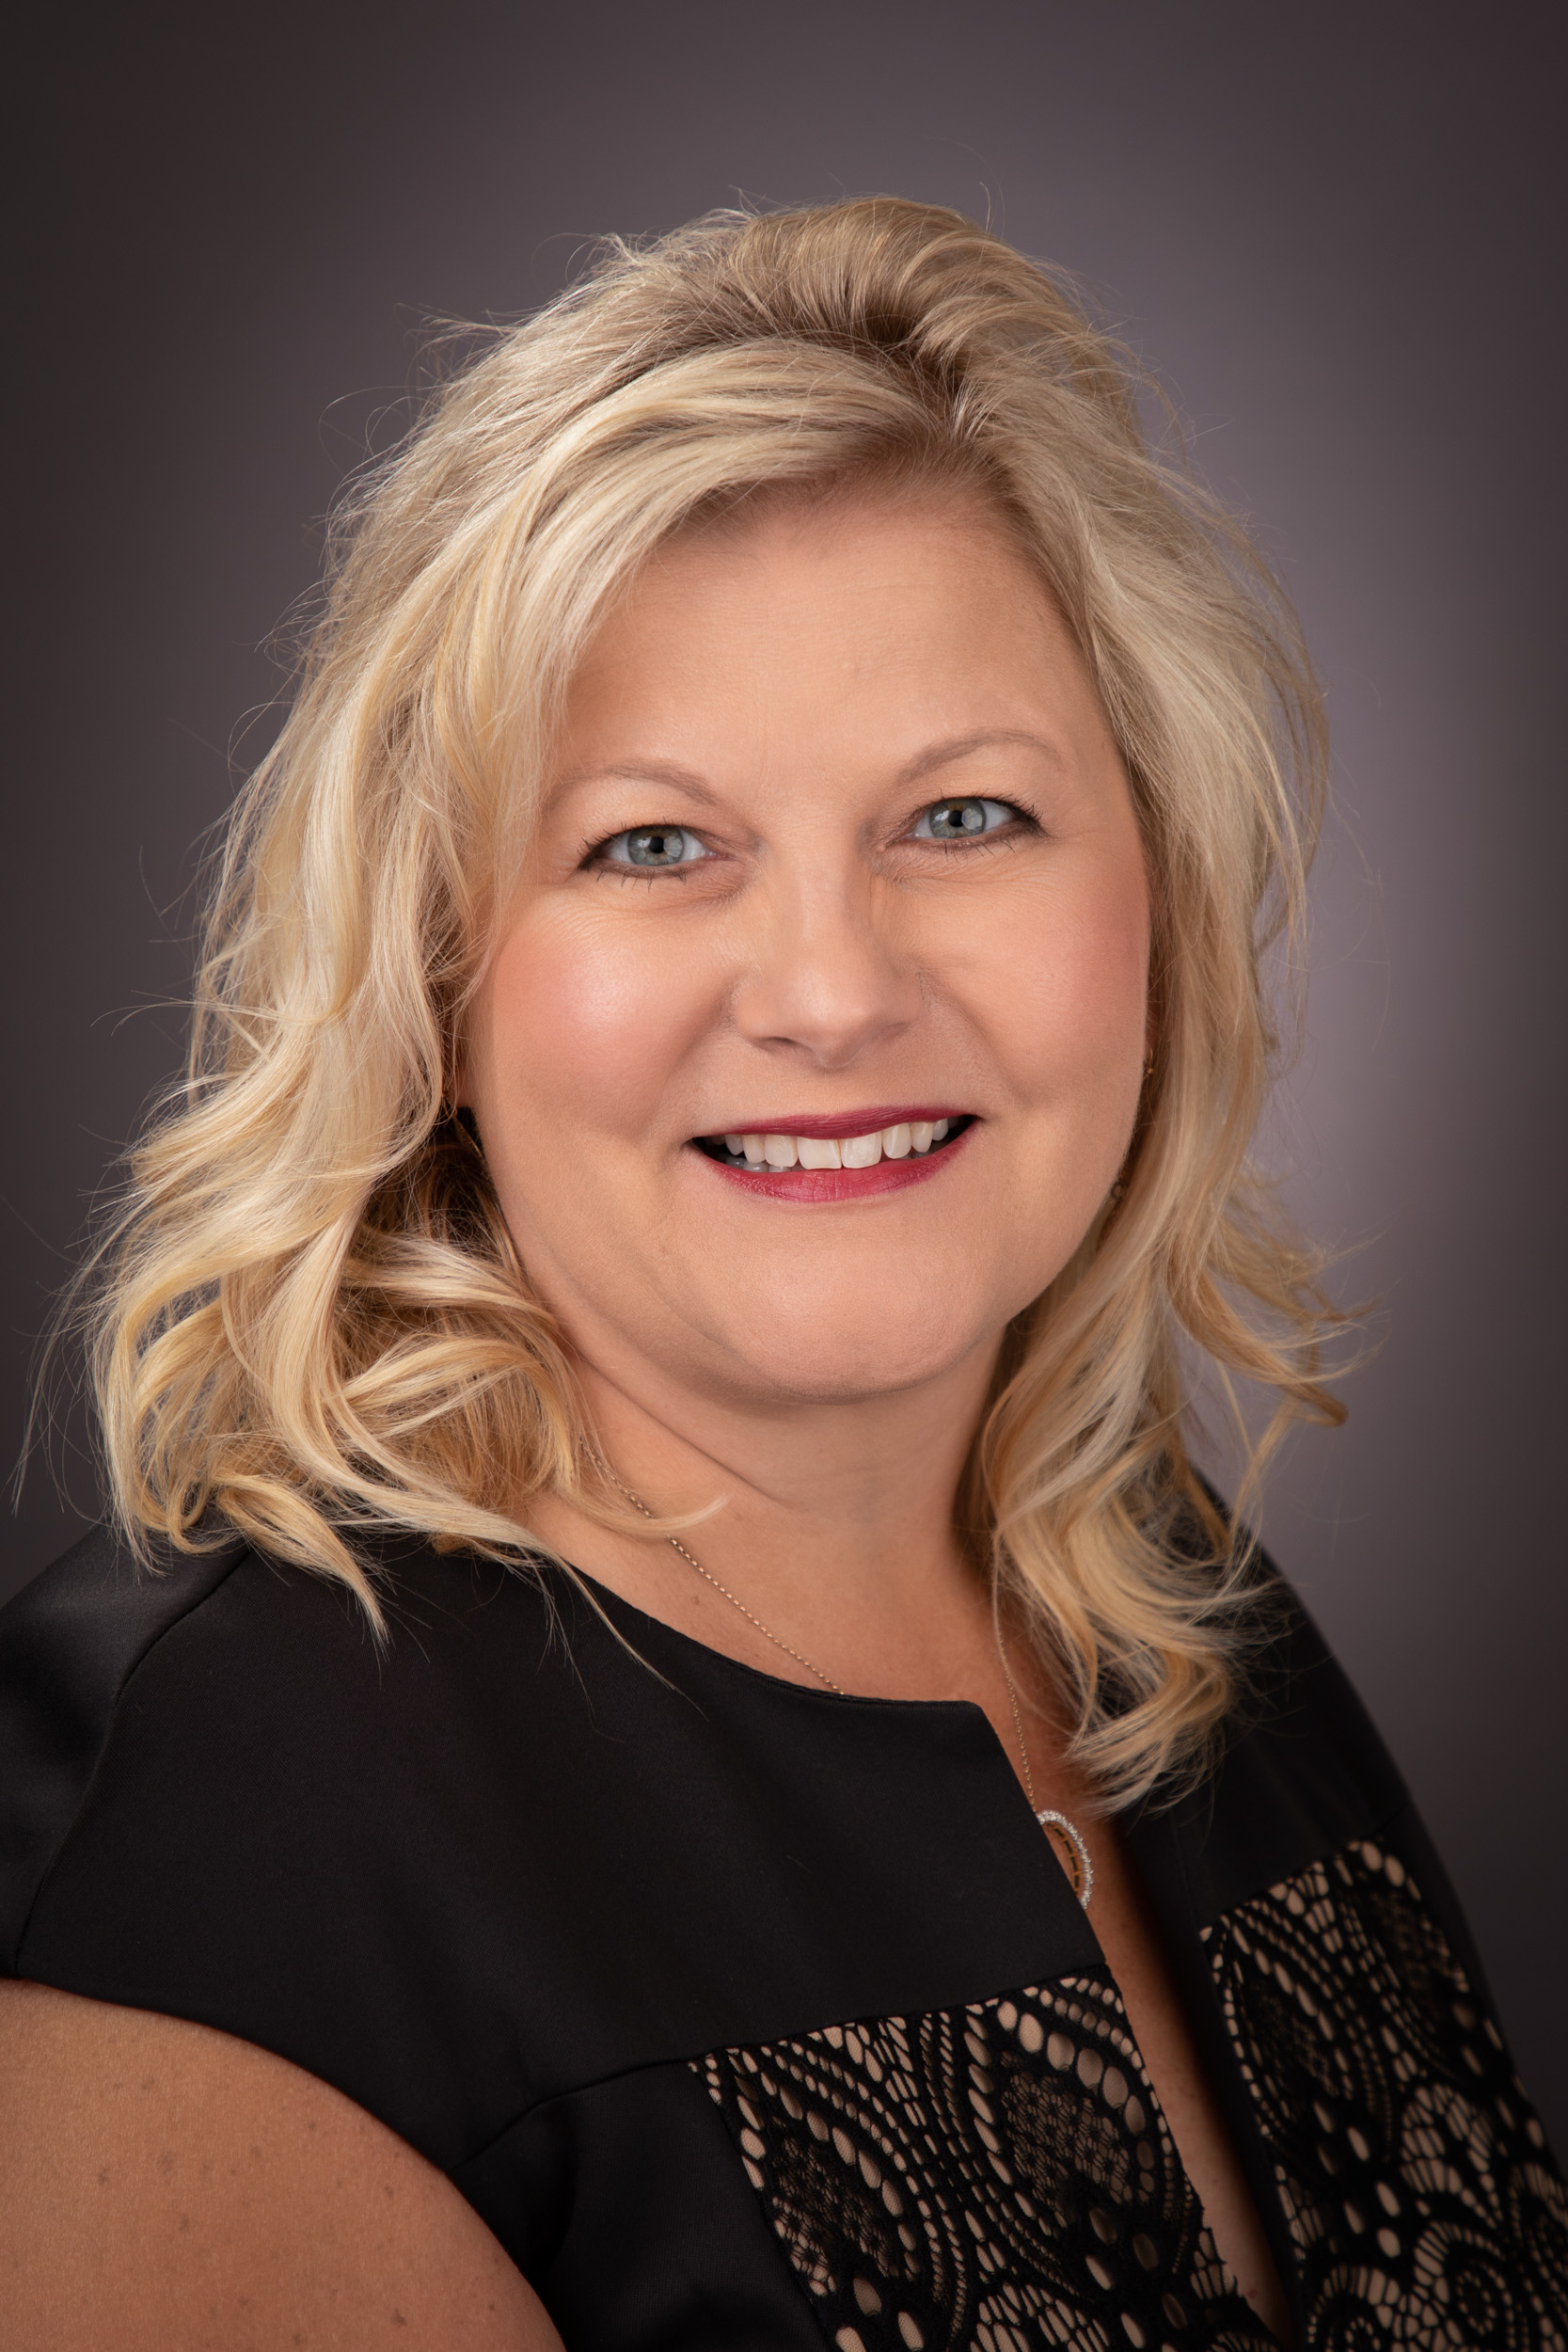 Ms. Kari Mullikin, VTA